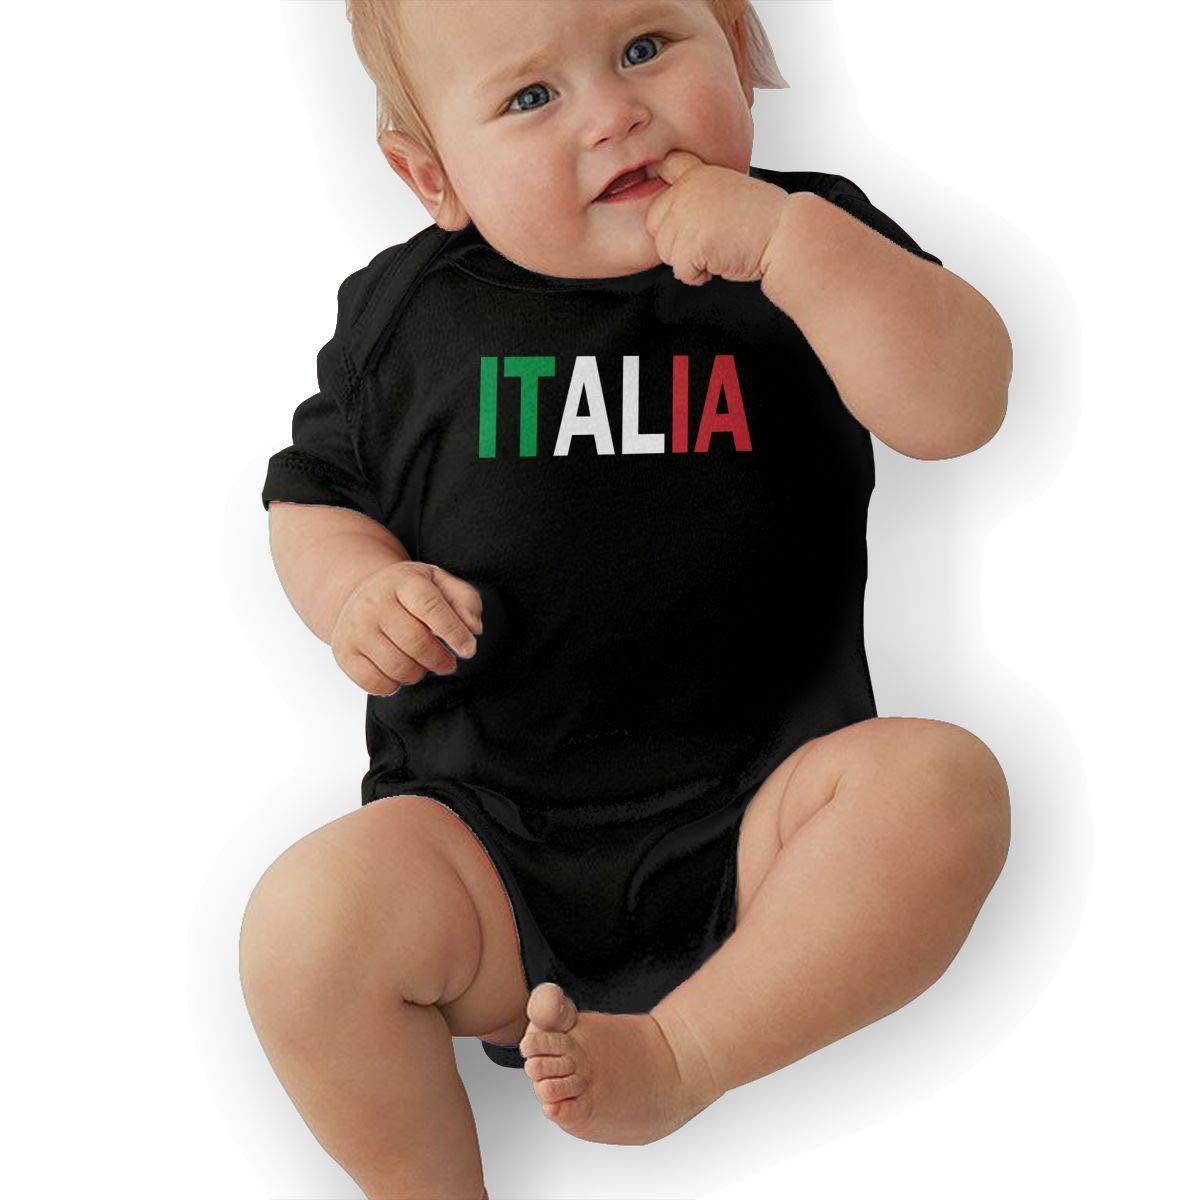 U88oi-8 Short Sleeve Cotton Bodysuit for Unisex Baby Cute Italia Sleepwear